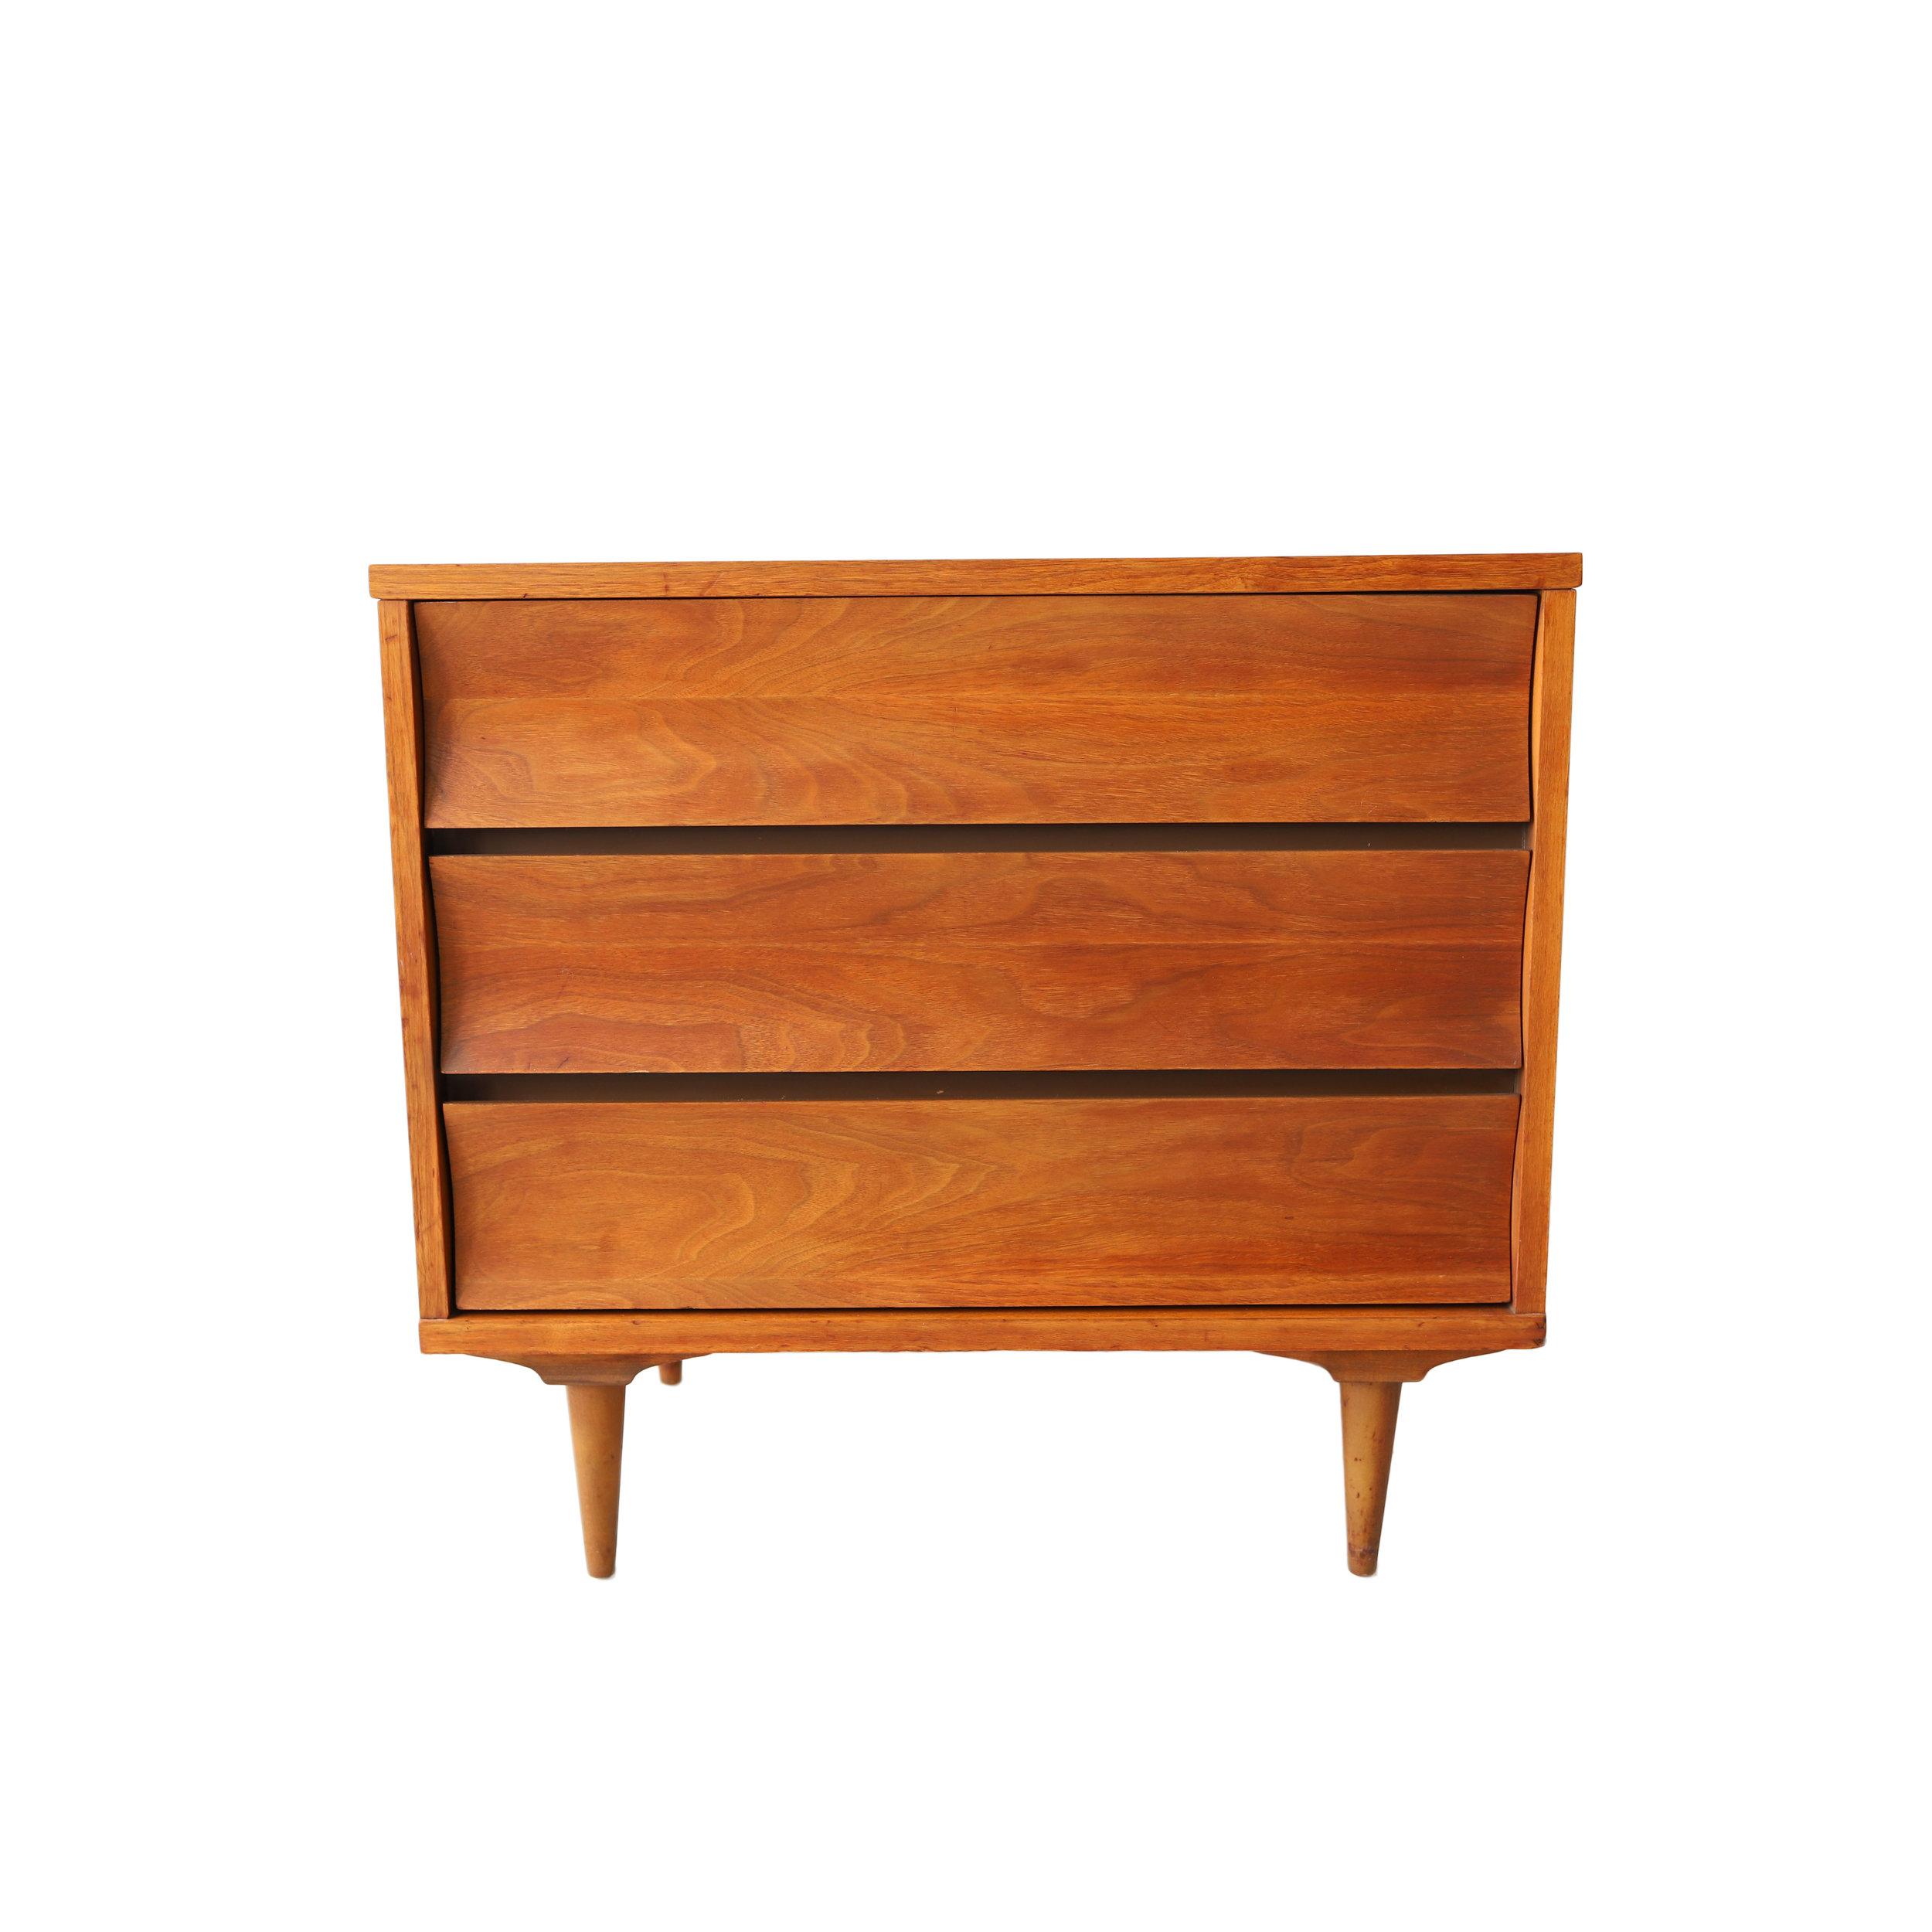 vintage mid century modern 3 drawer dresser by johnson carper.jpg